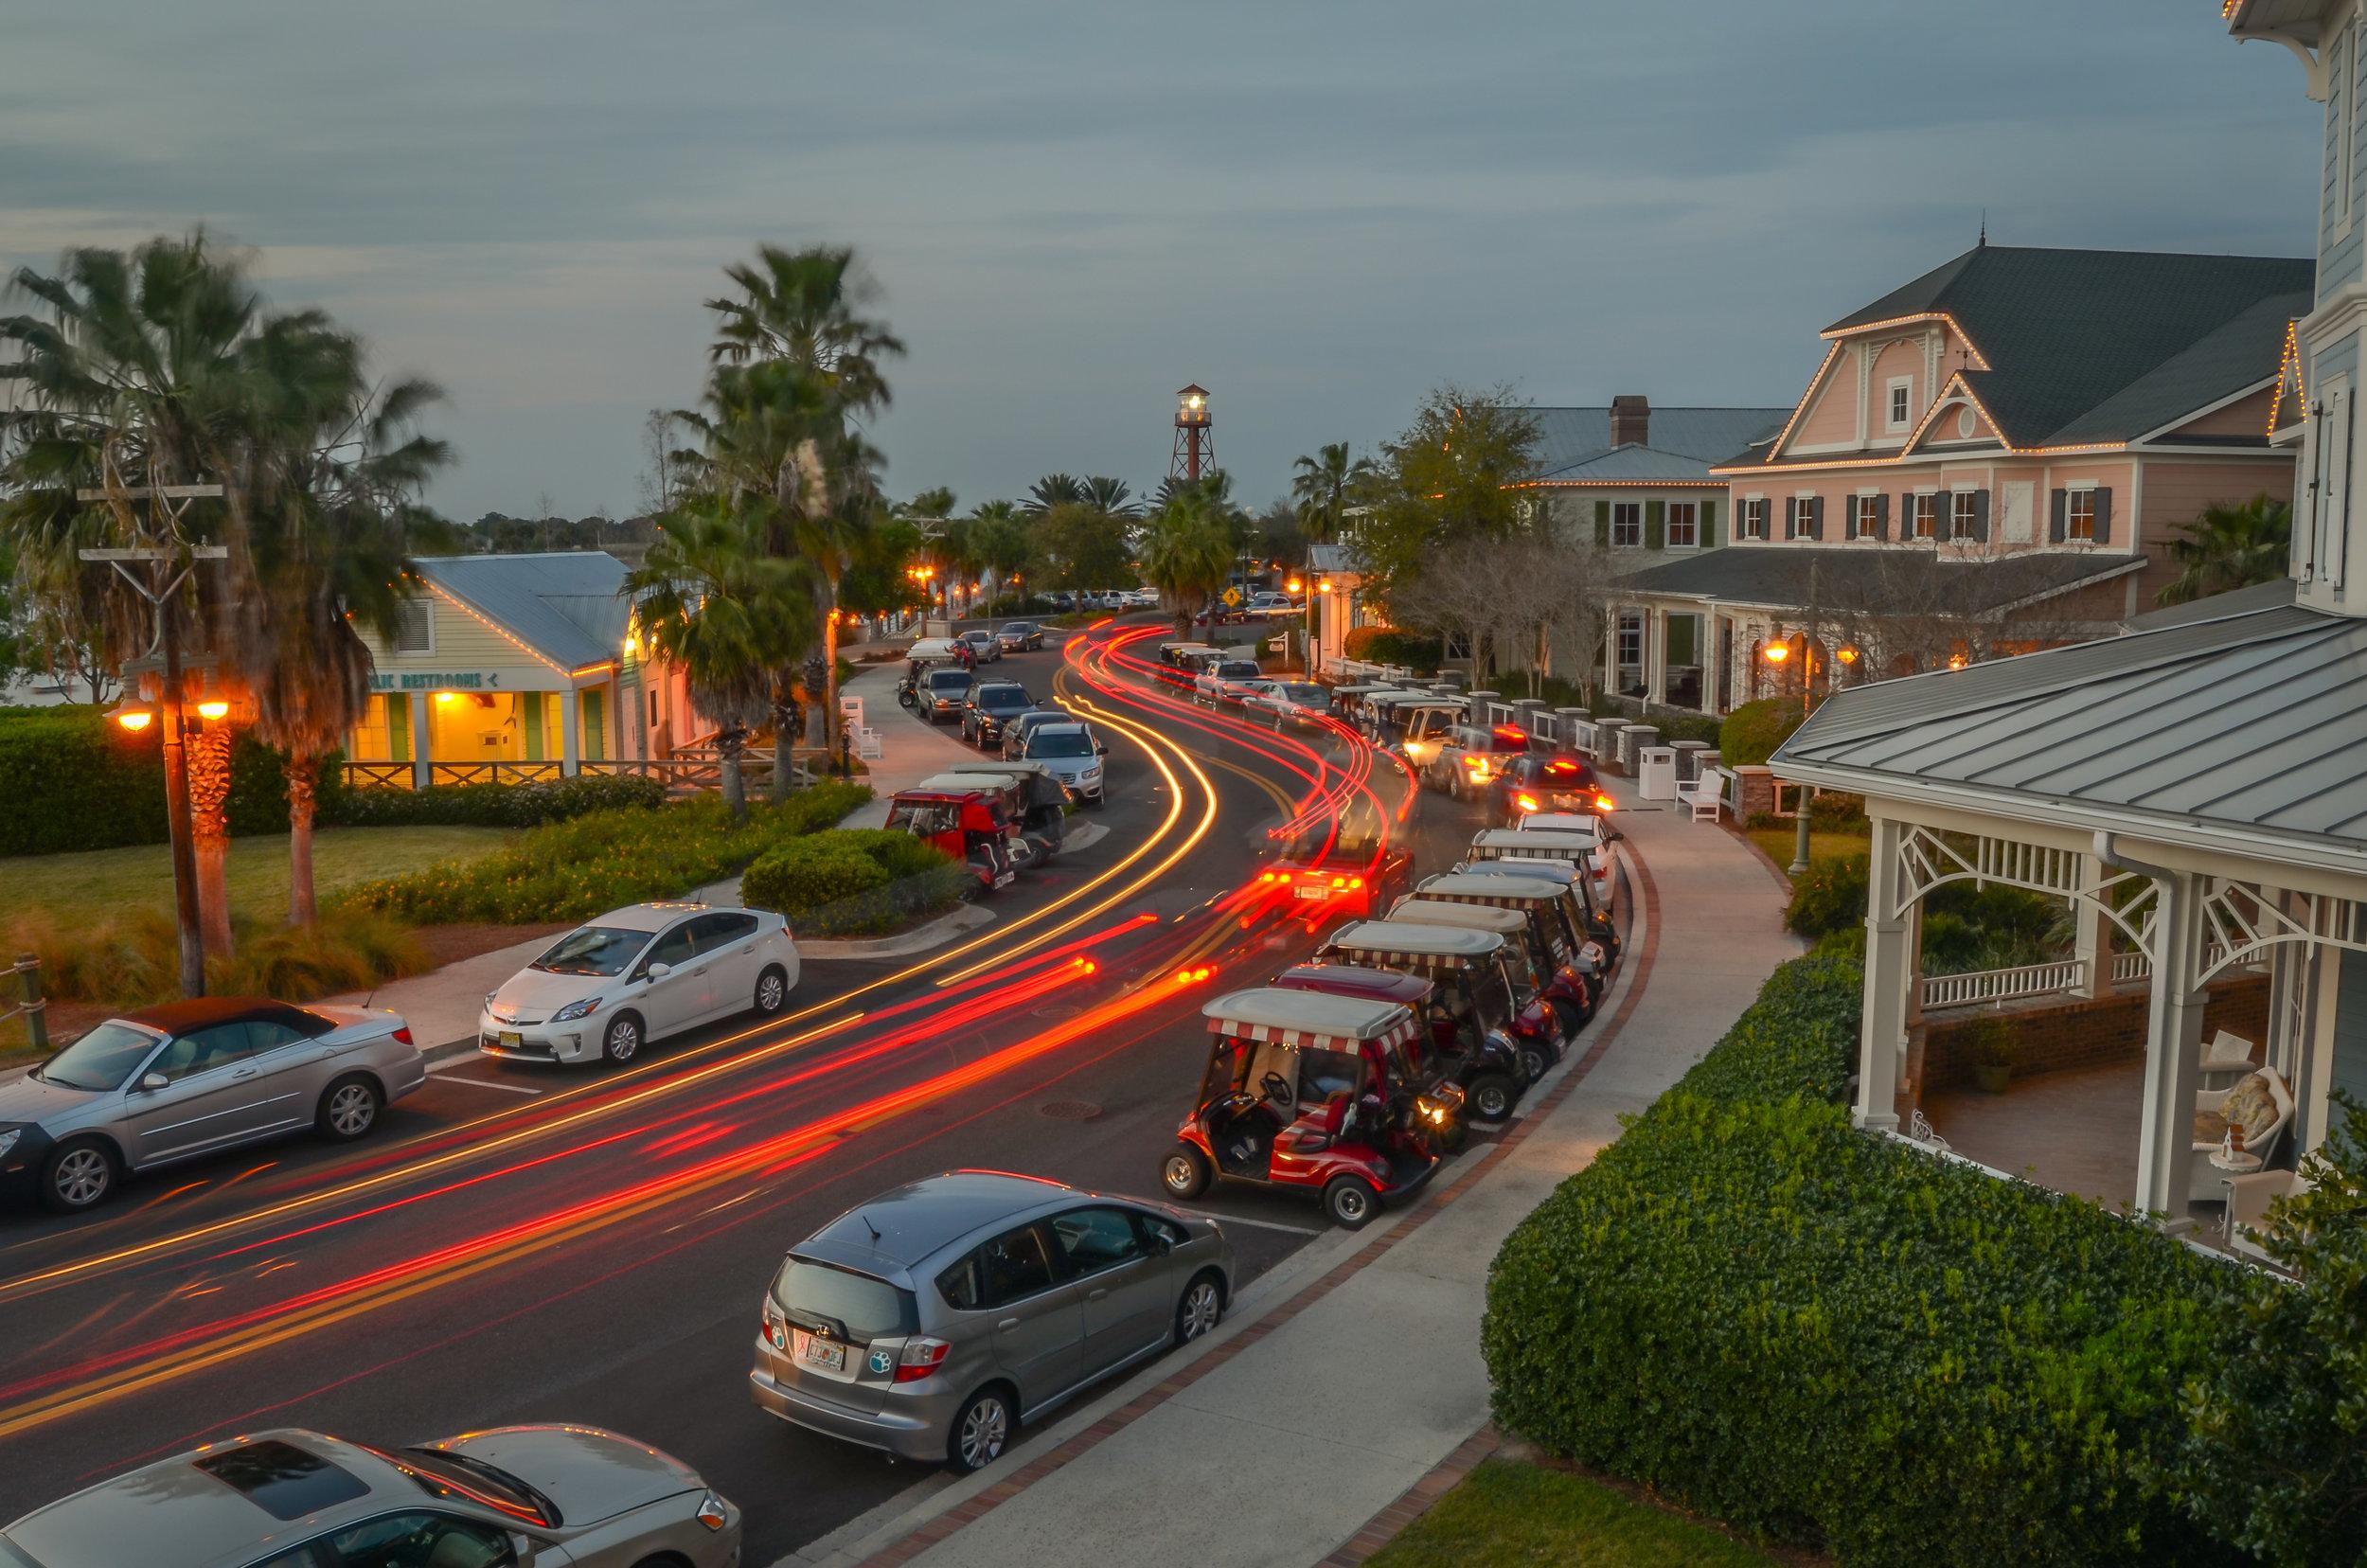 lighthouse-lake sumter-rush hour-the villages-florida.jpg